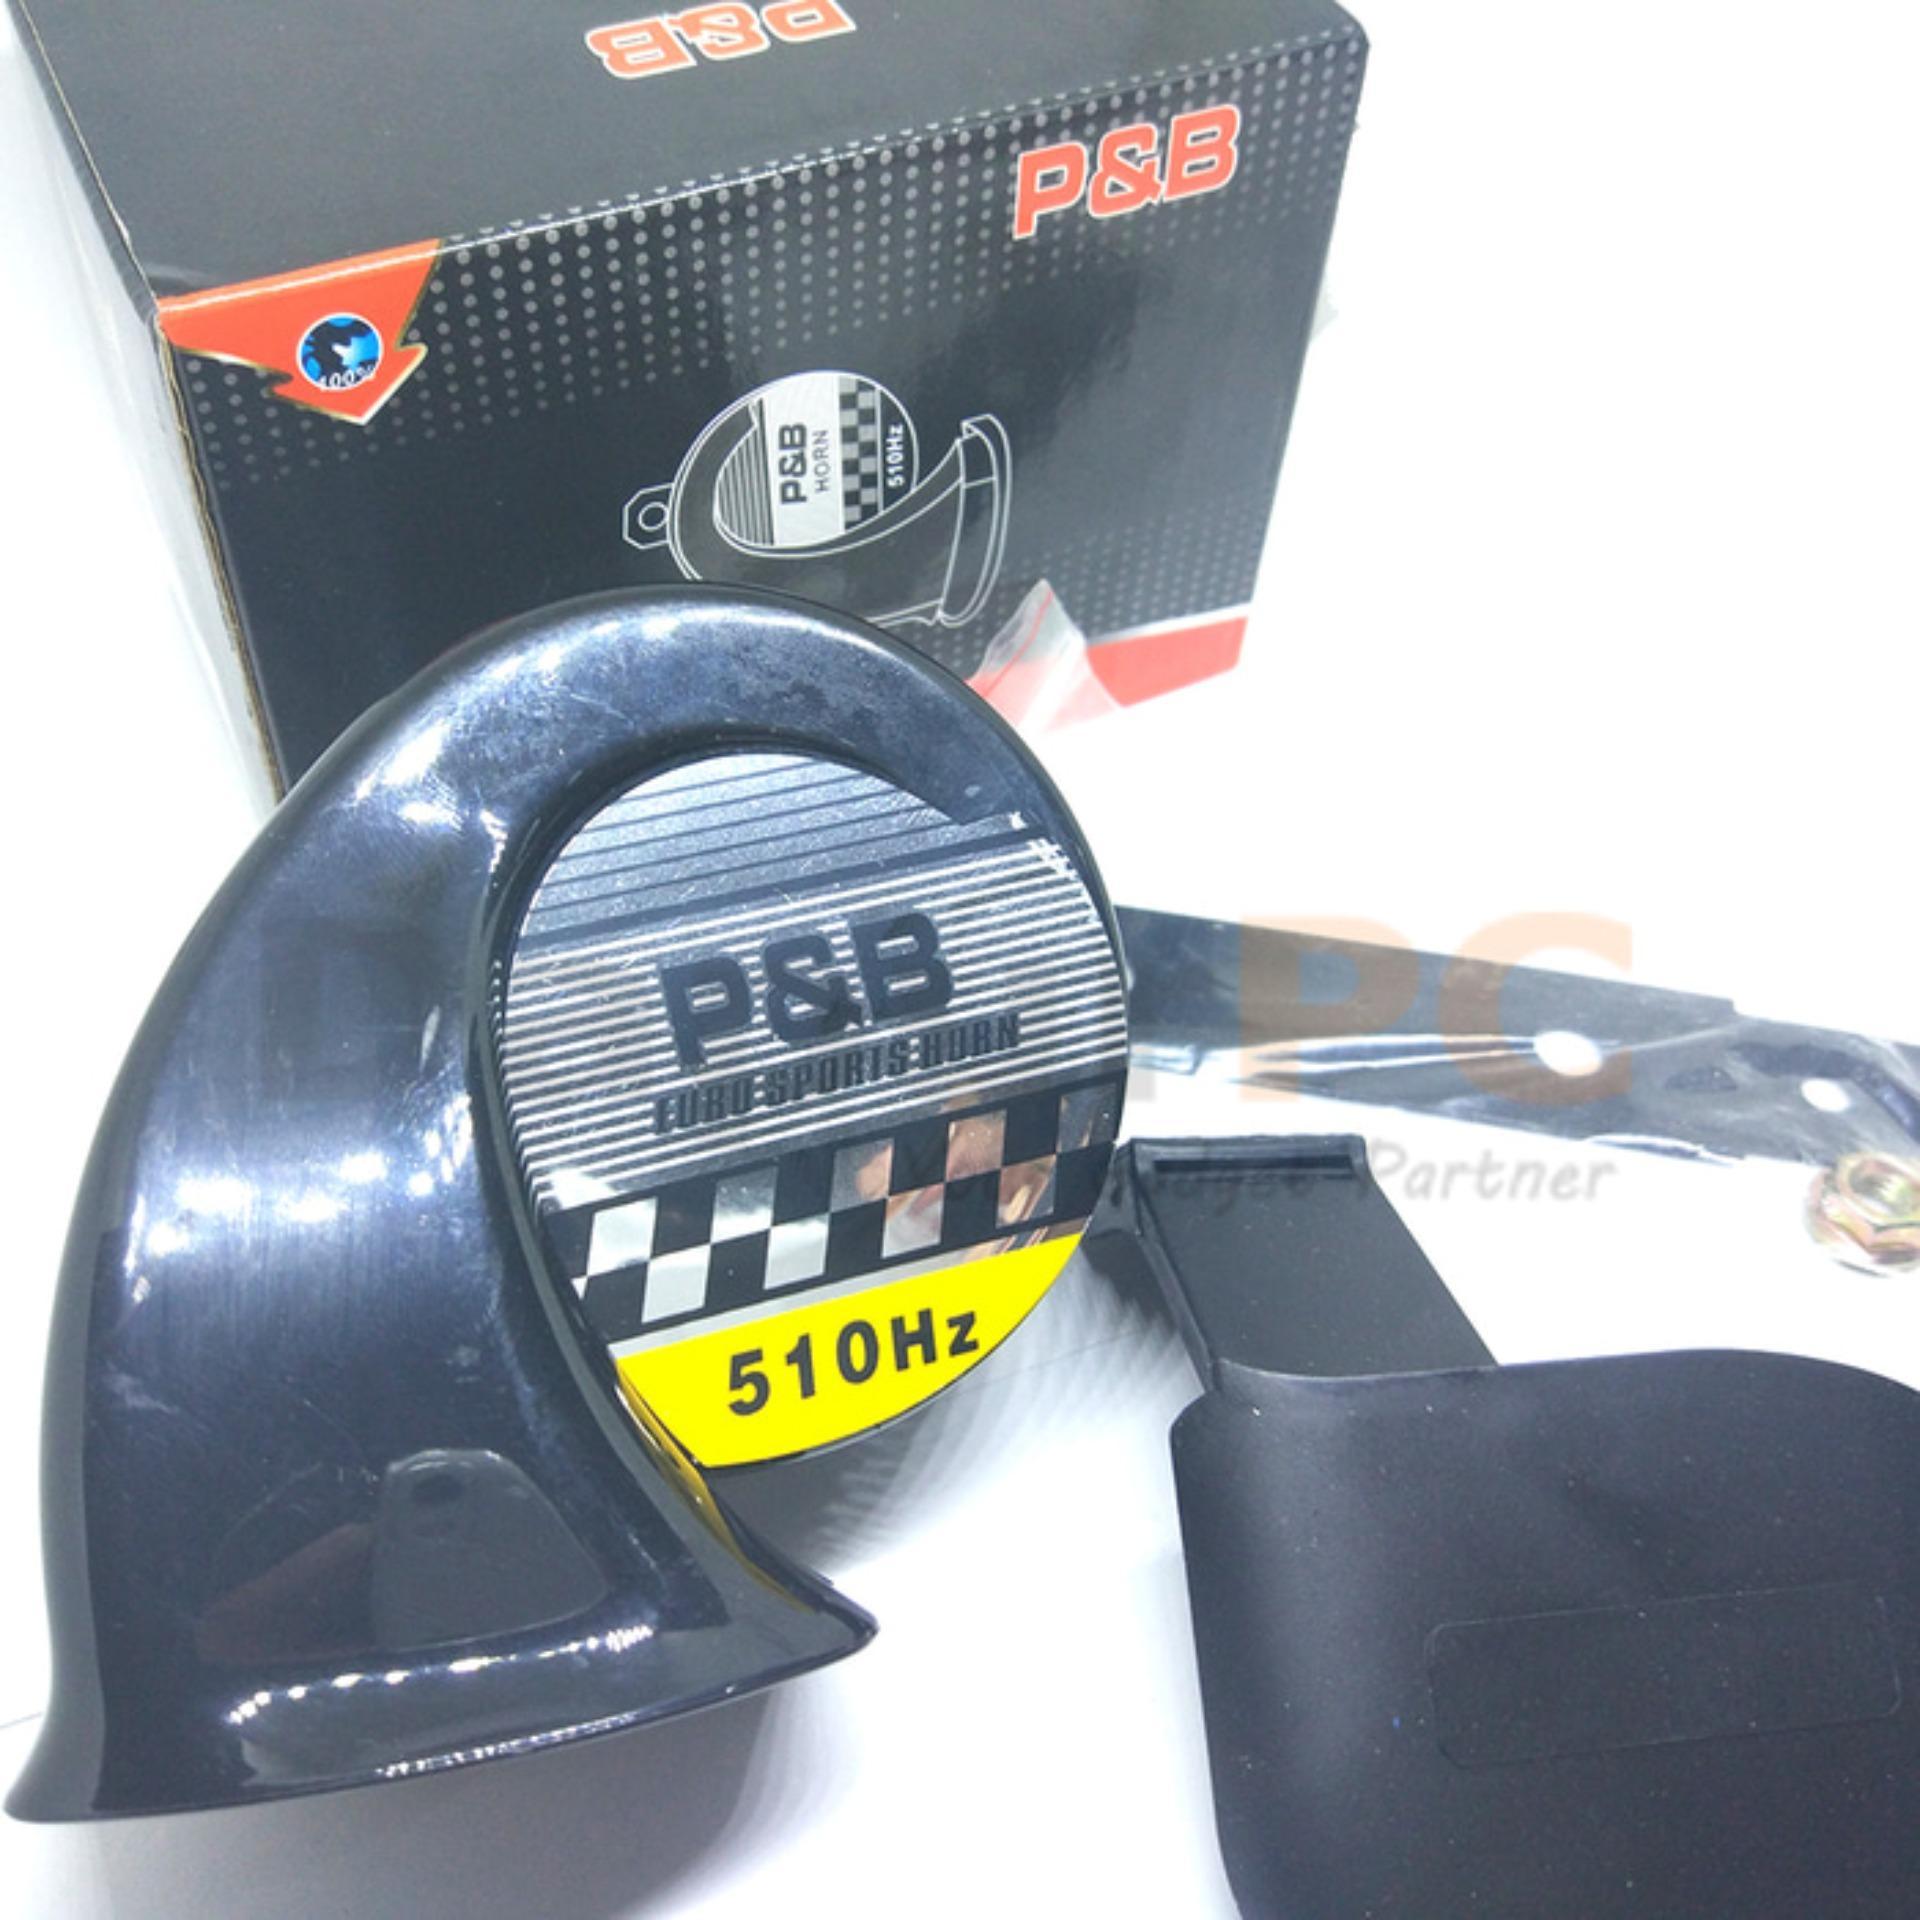 Klakson Keong Single Tone - 12 Volt Motor P&B Murah Suara Nge- .